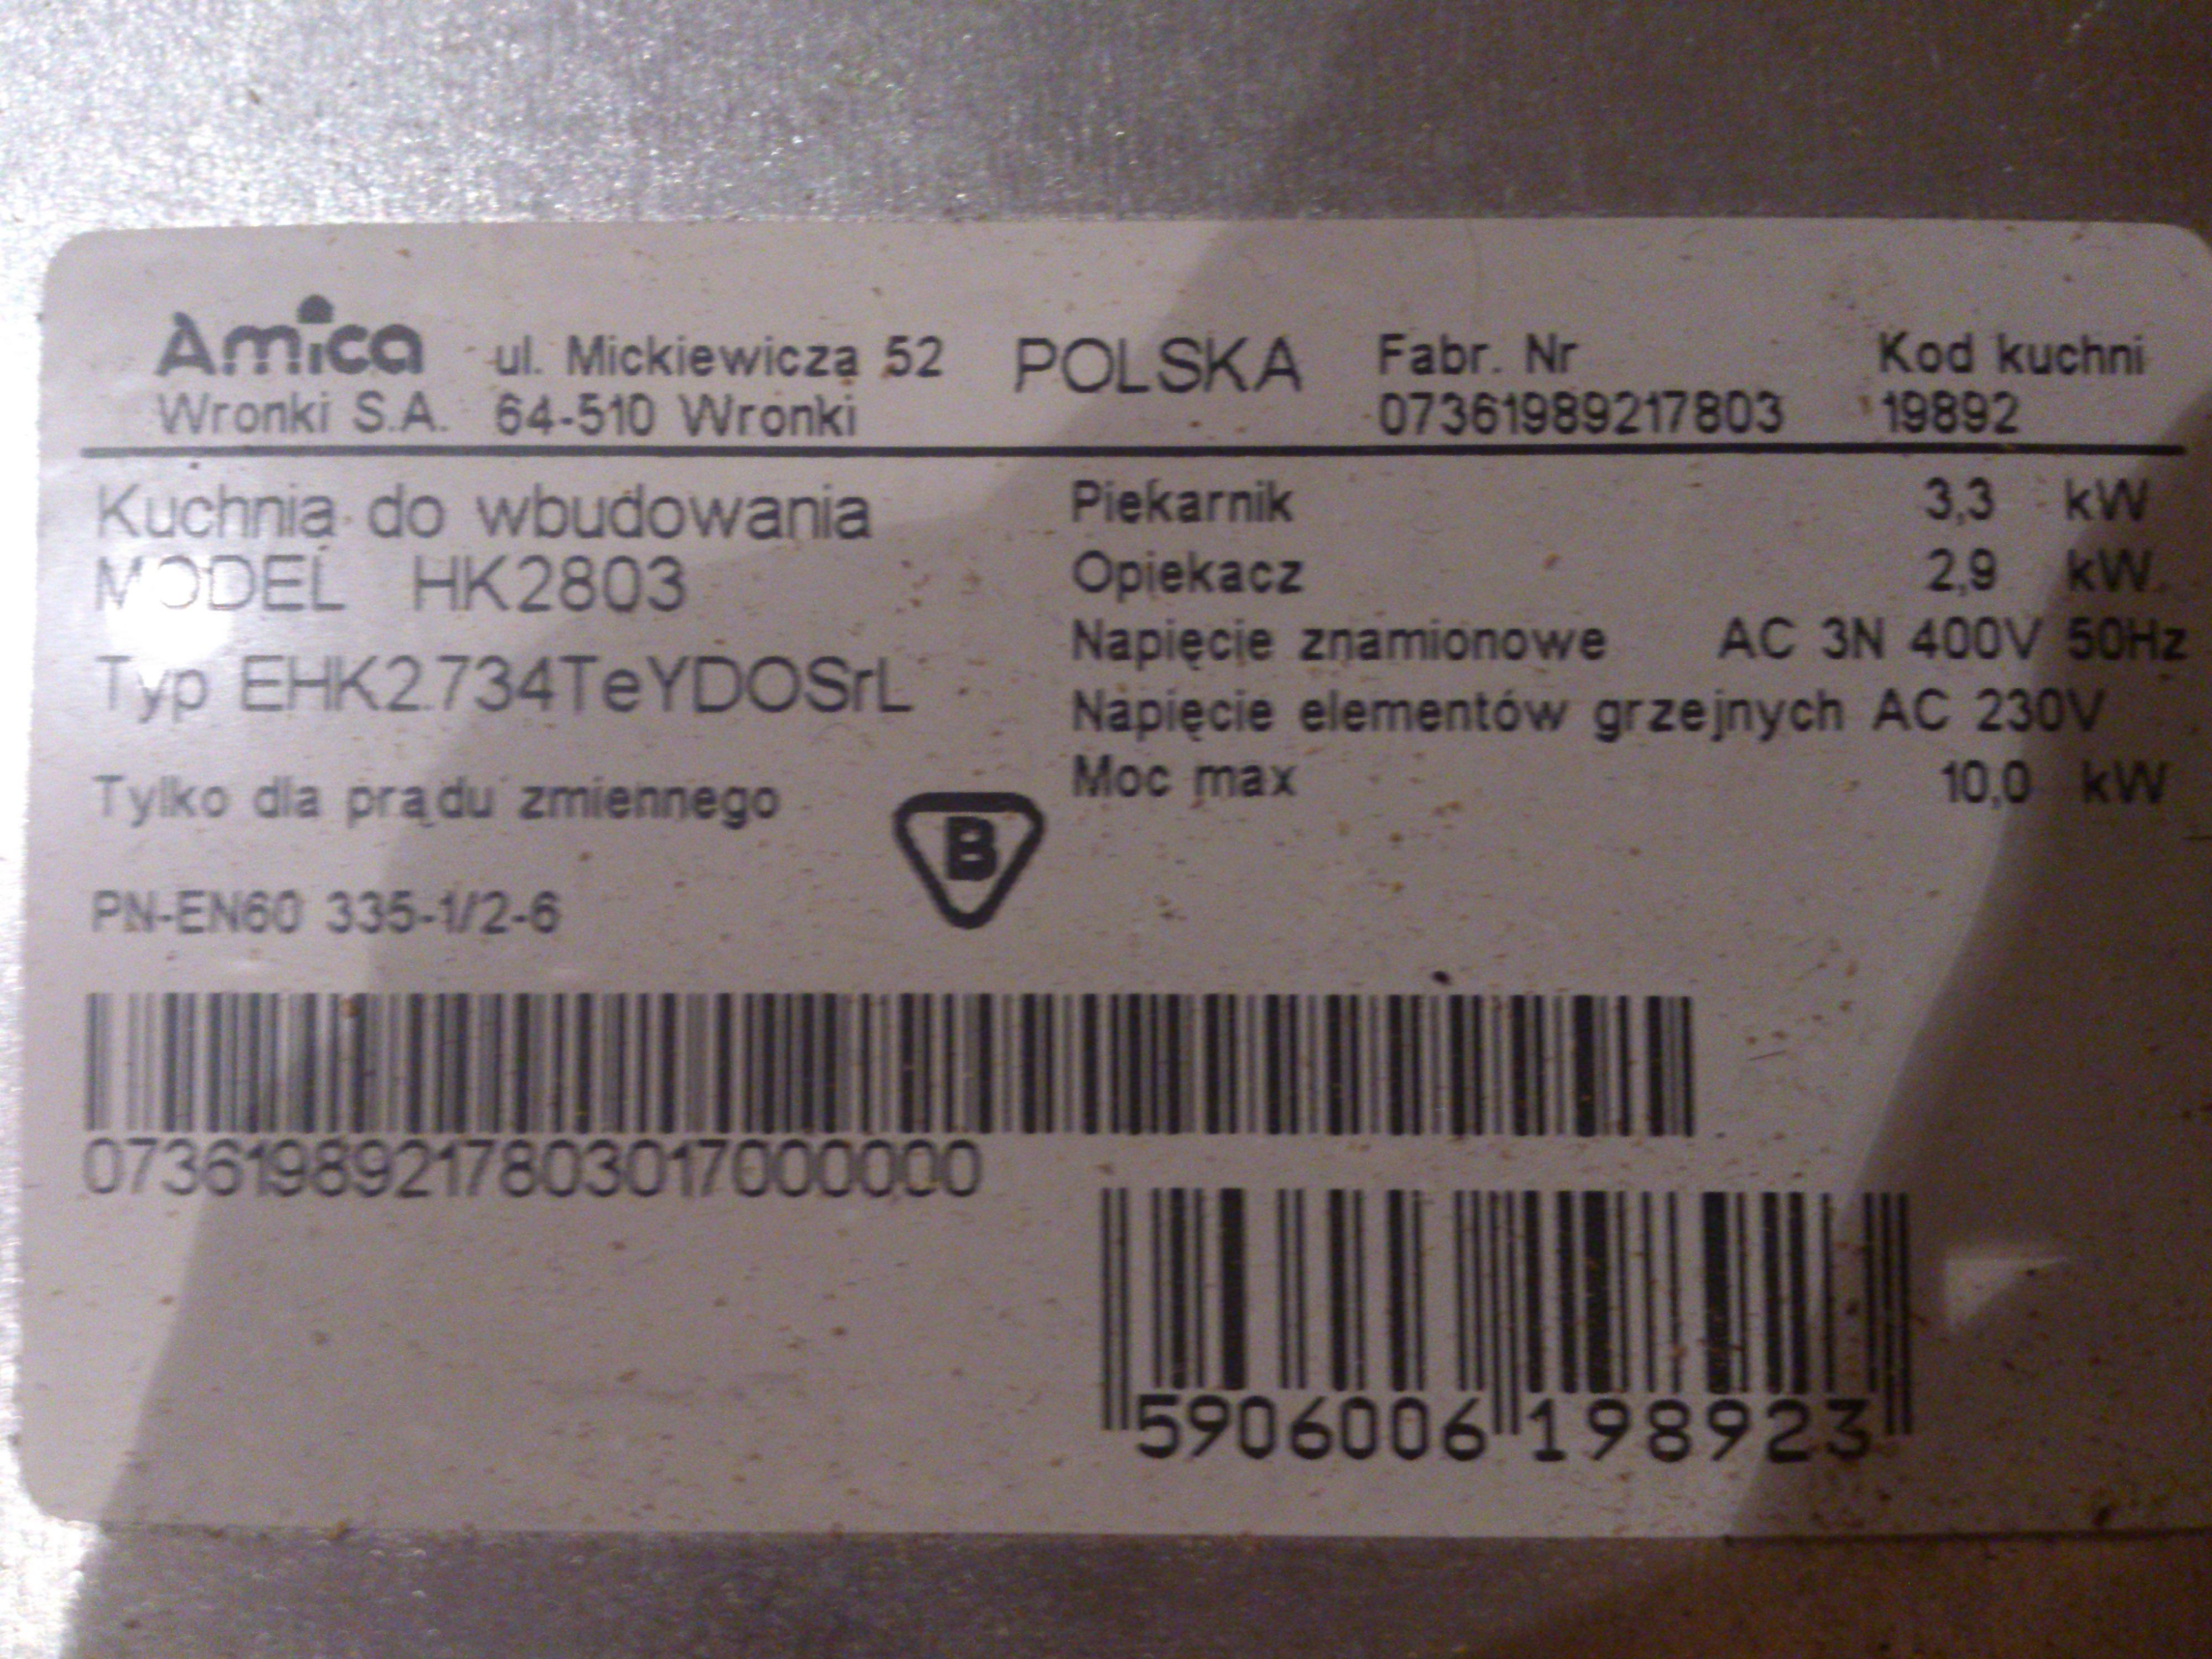 Przerobienie piekarnika na 230V Amica Model HK2803  Typ EHK2734TeYDOSrL